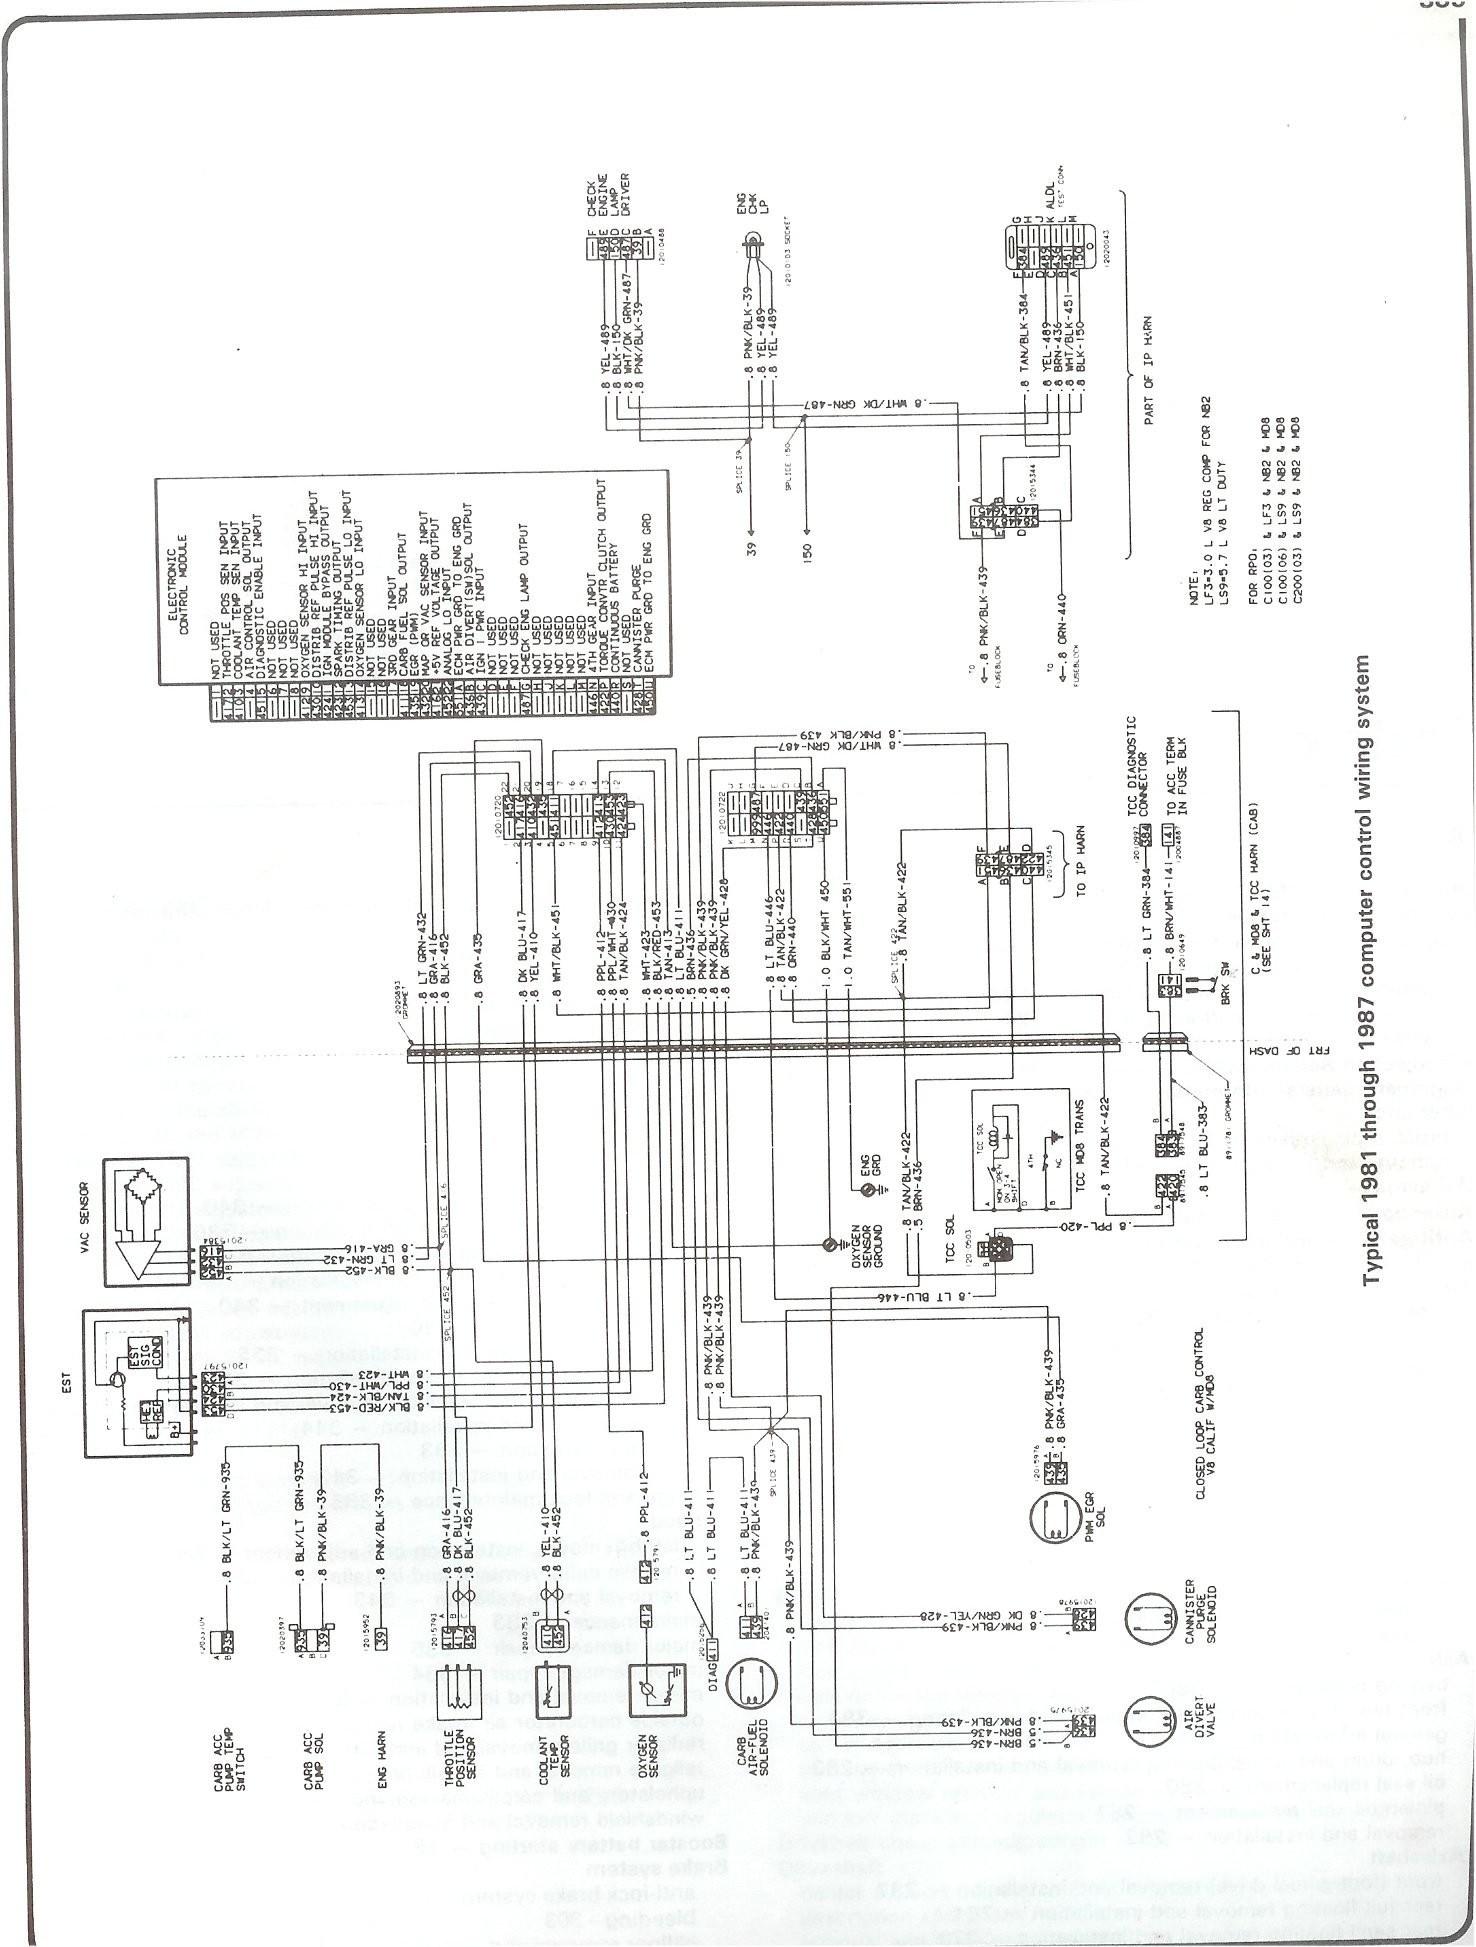 Gmc Sierra    Wiring       Diagram      My    Wiring       DIagram